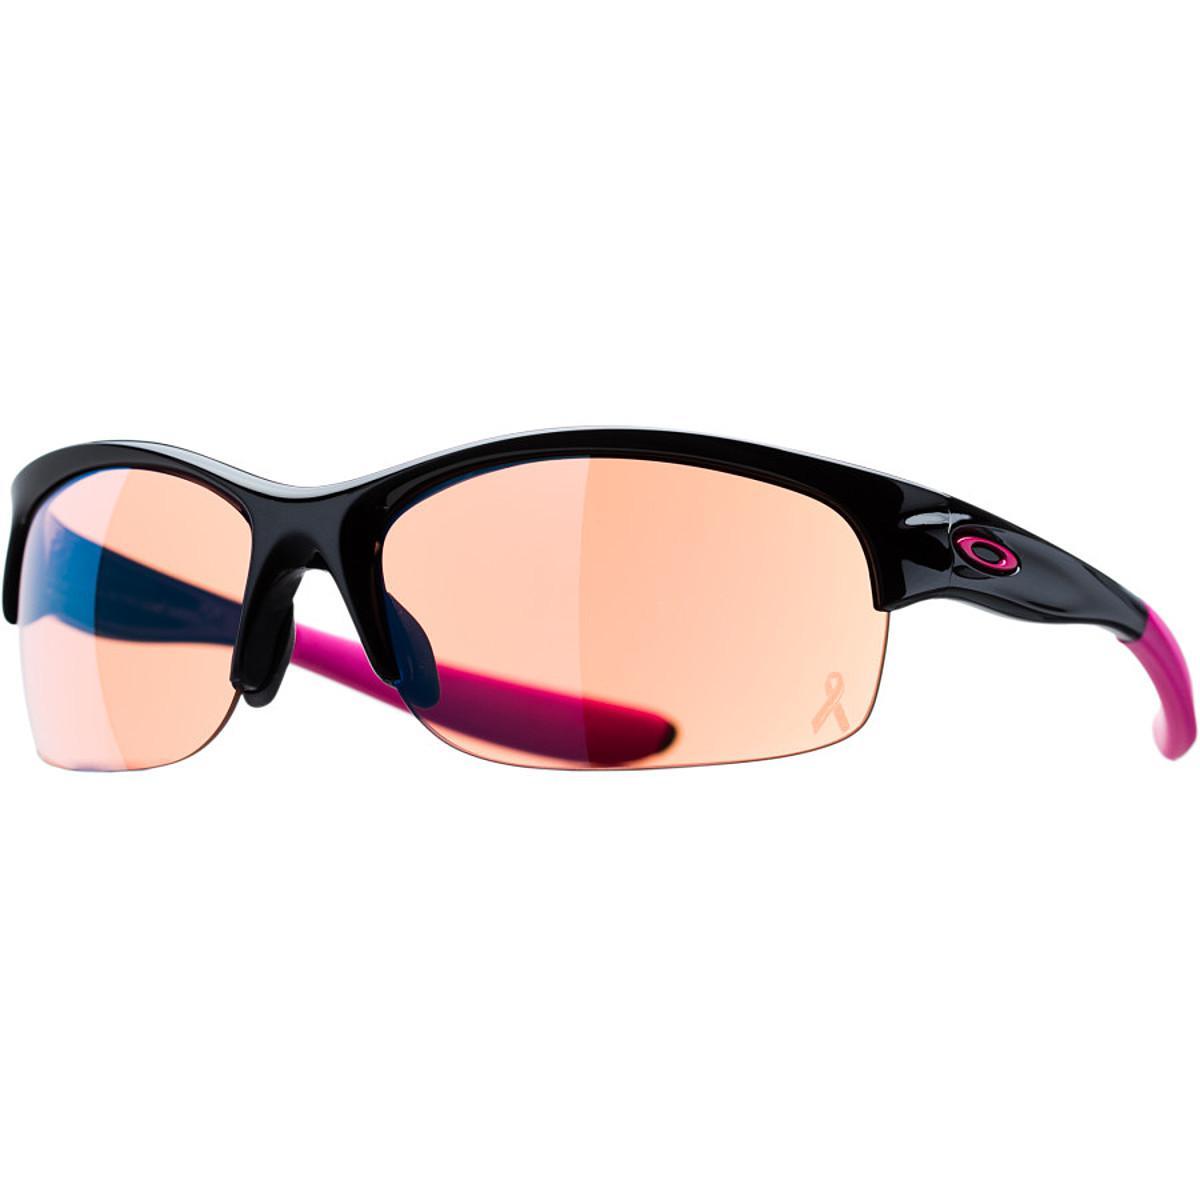 bcd41f7007 Lyst - Oakley Ysc Commit Sq Signature Sunglasses in Black